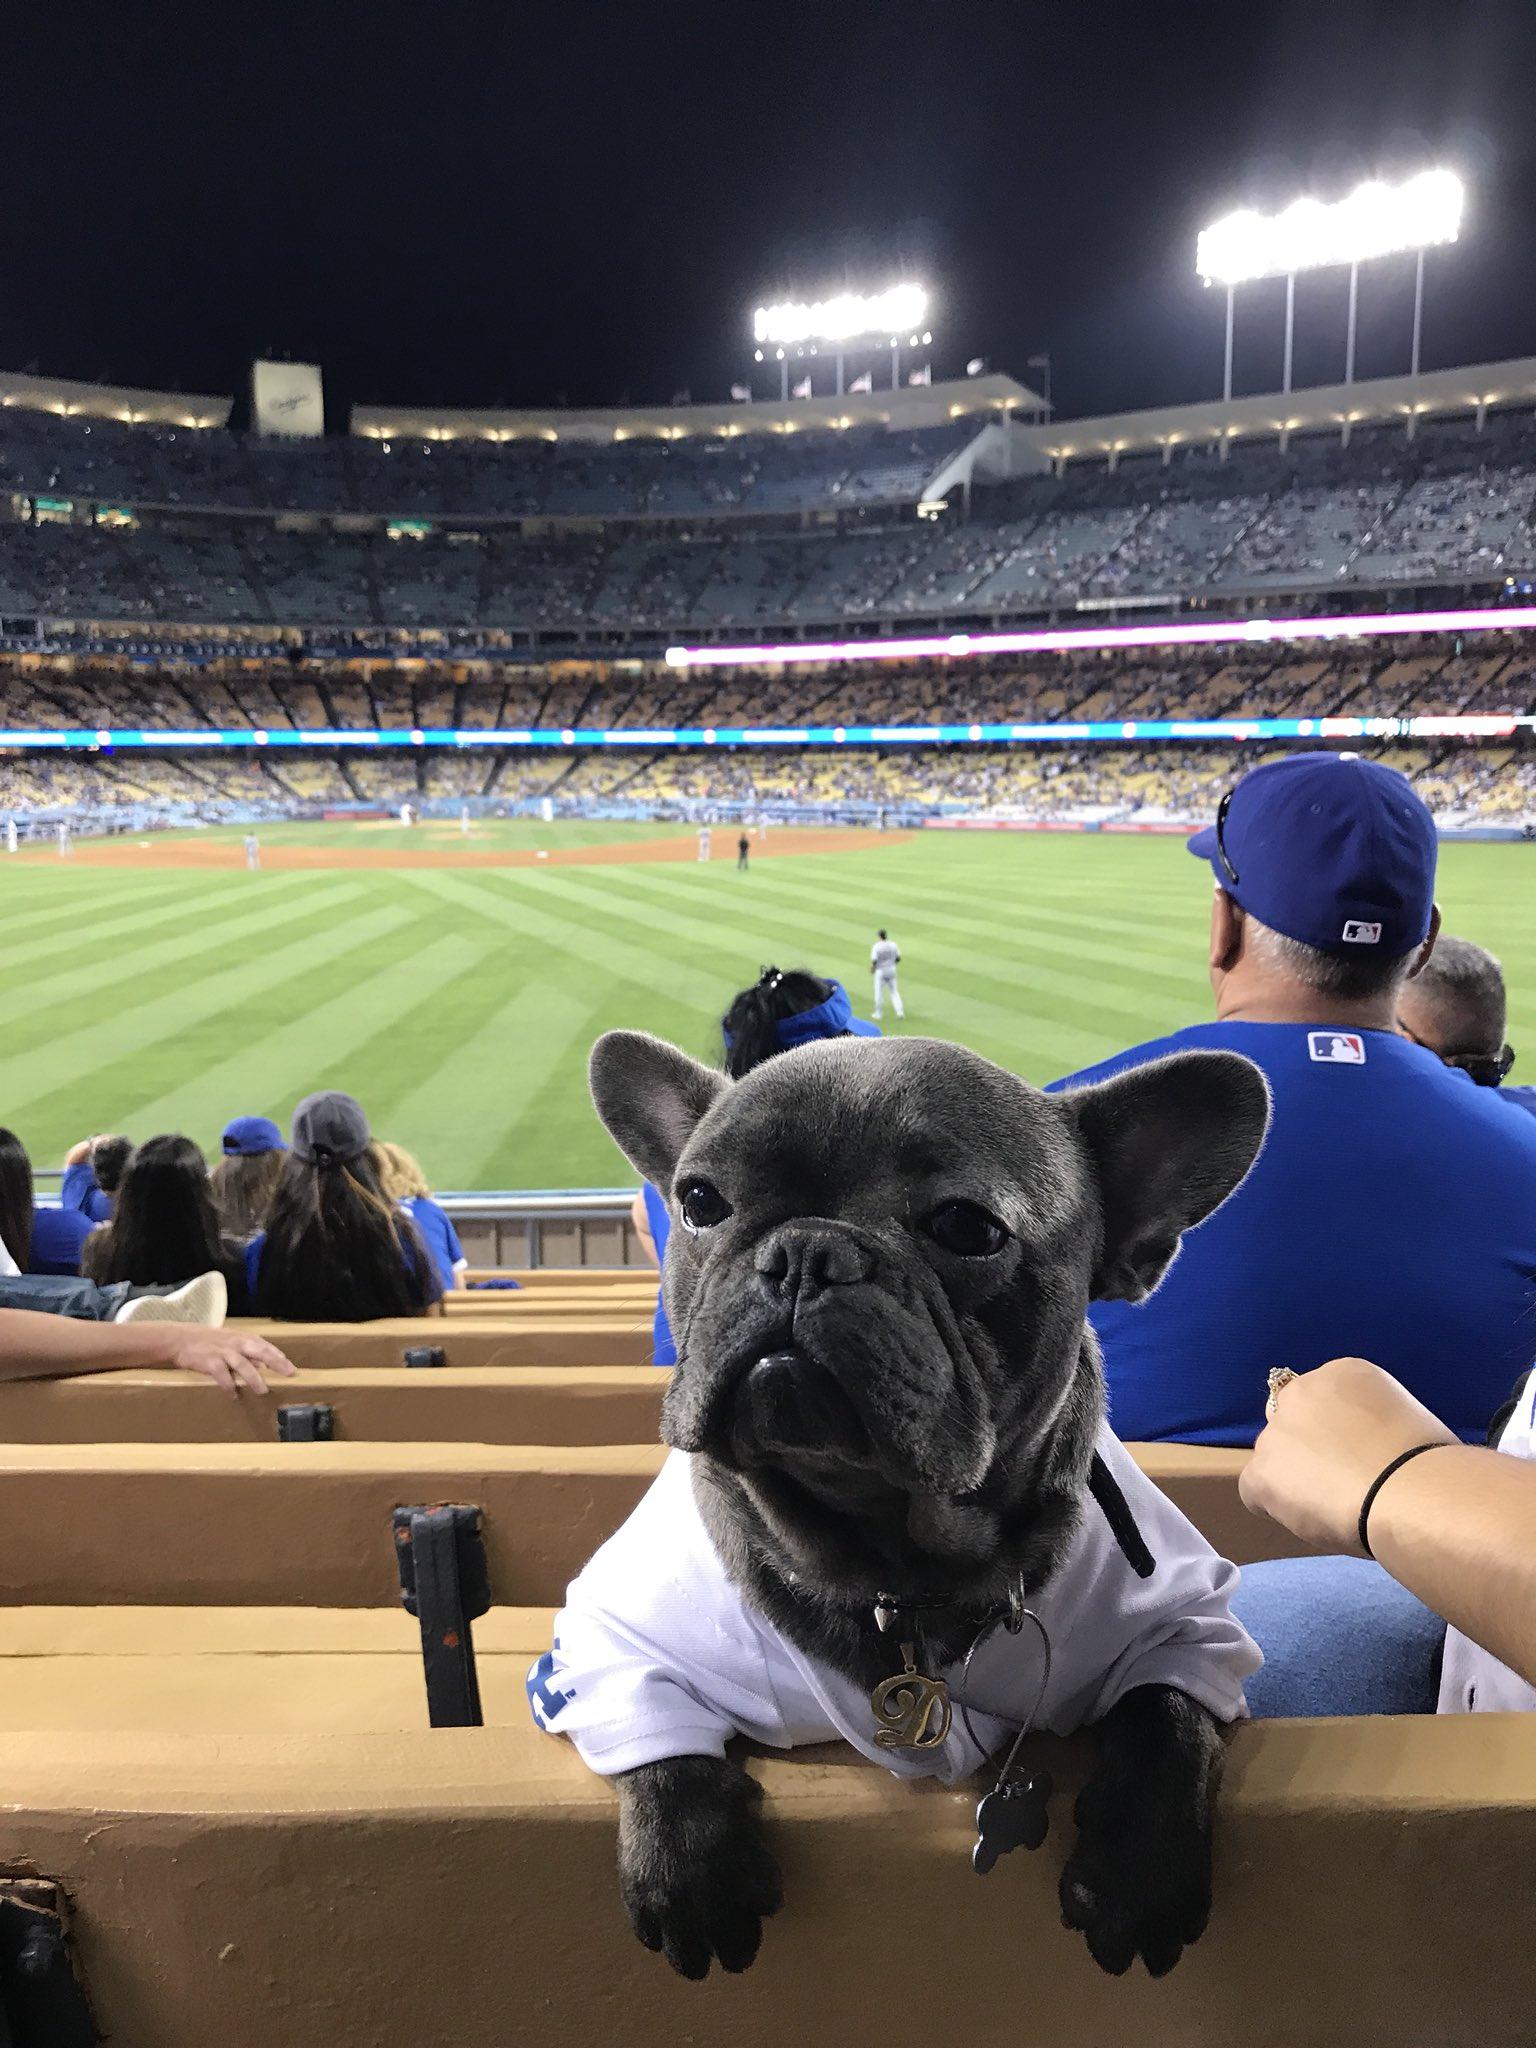 @Dodgers  https://t.co/VBwLnxQUK7